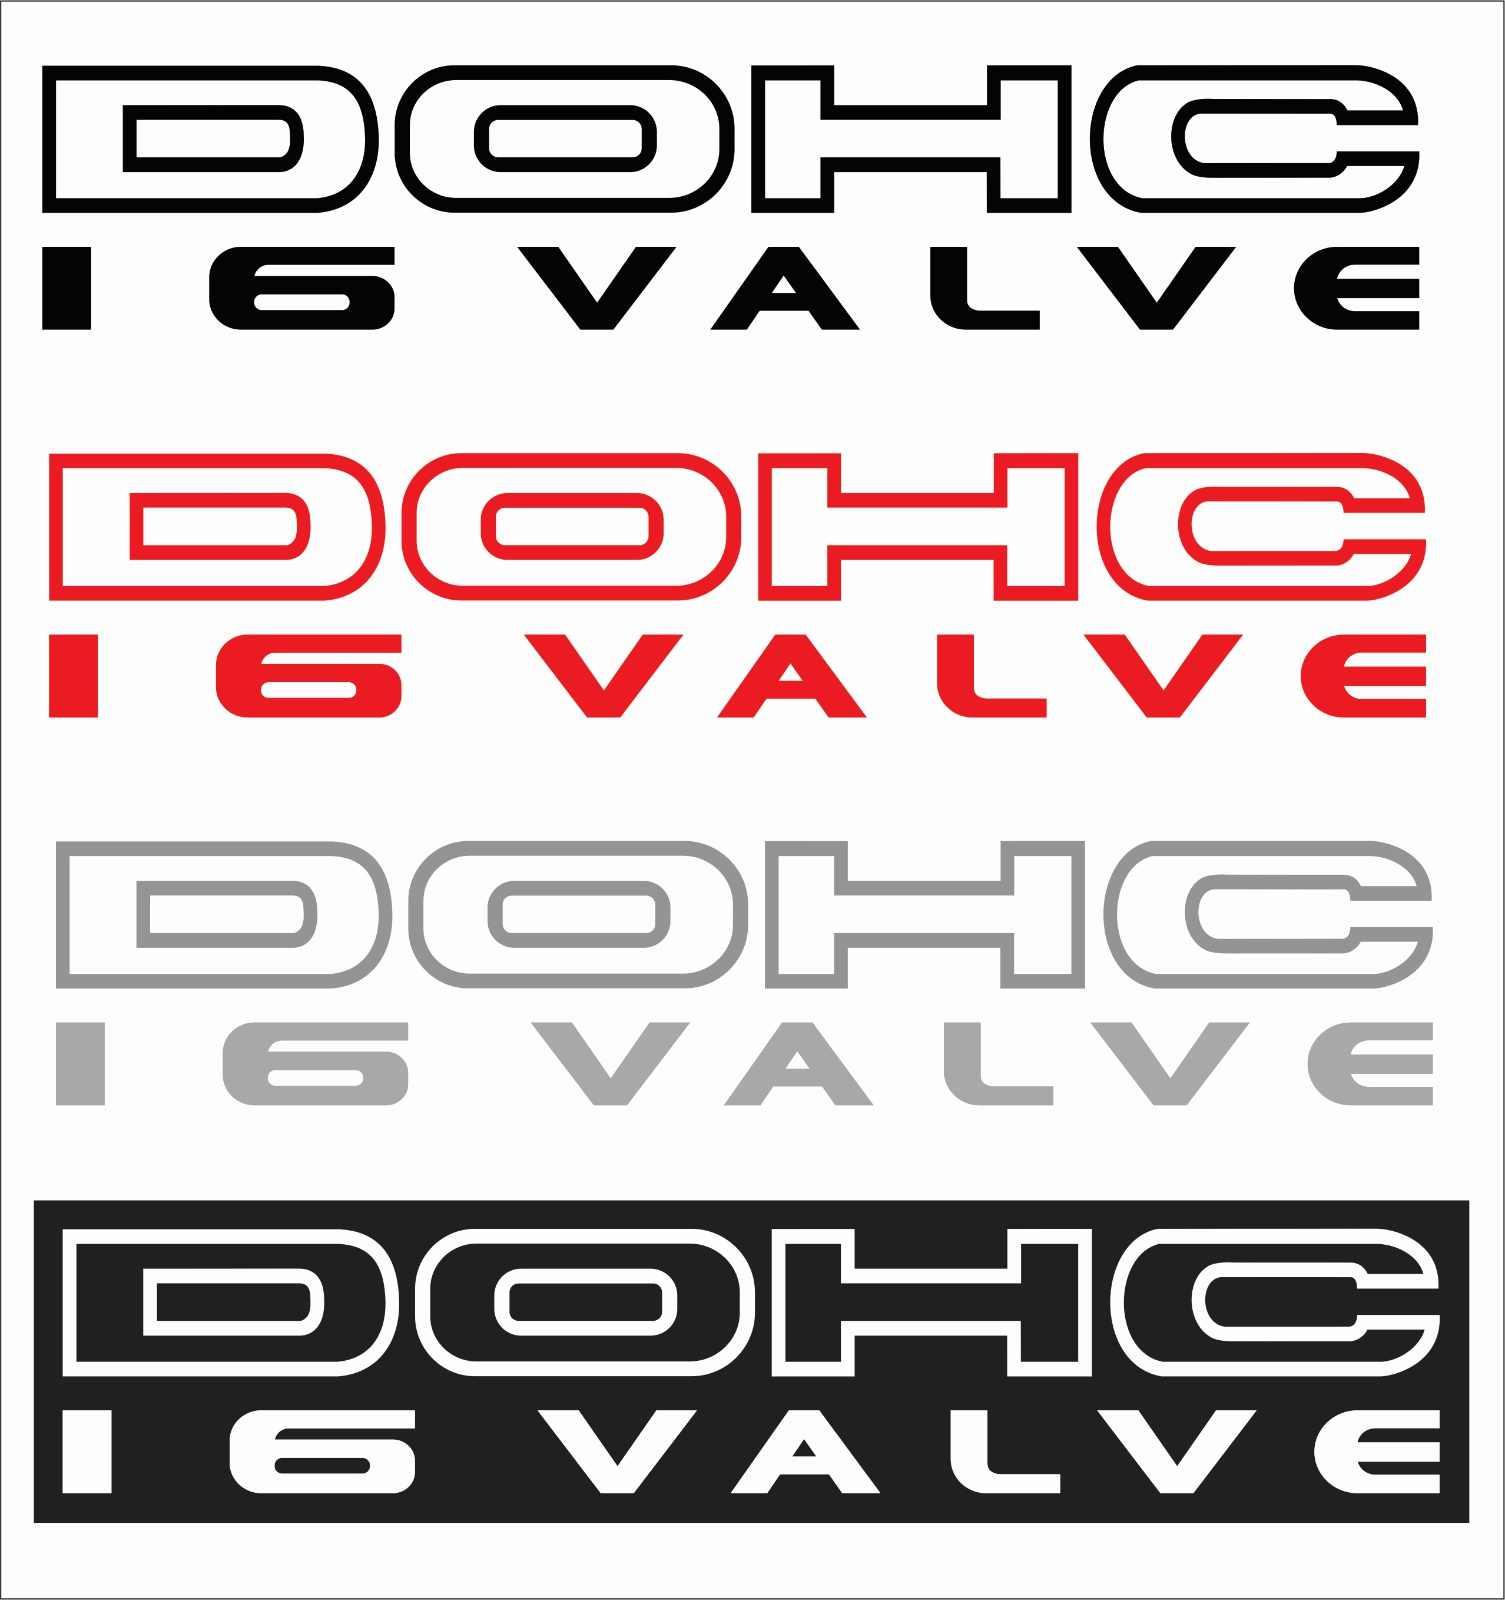 For 2pcs dohc 16 valve vinyl sticker decals set of 2